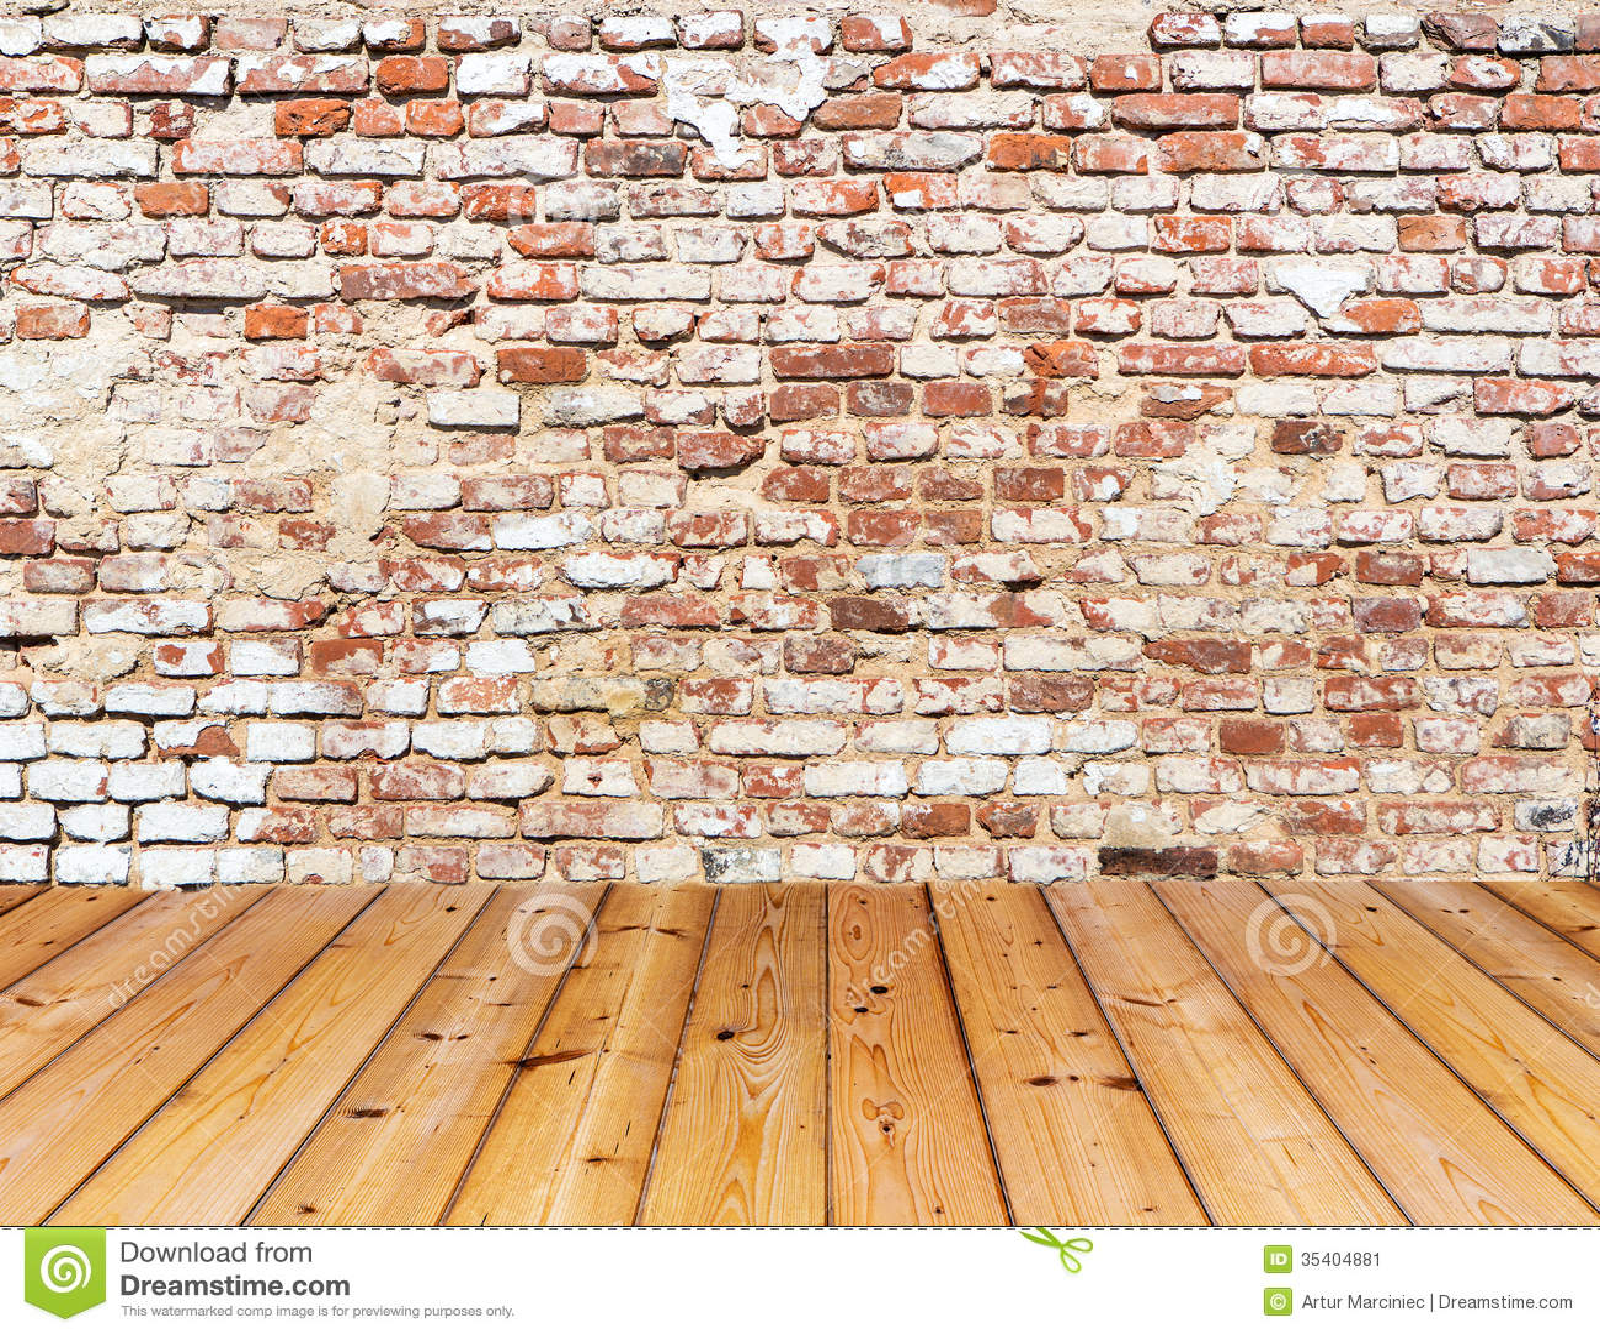 Interior Brick Flooring Pricing : Old brick wall on wood floor stock image